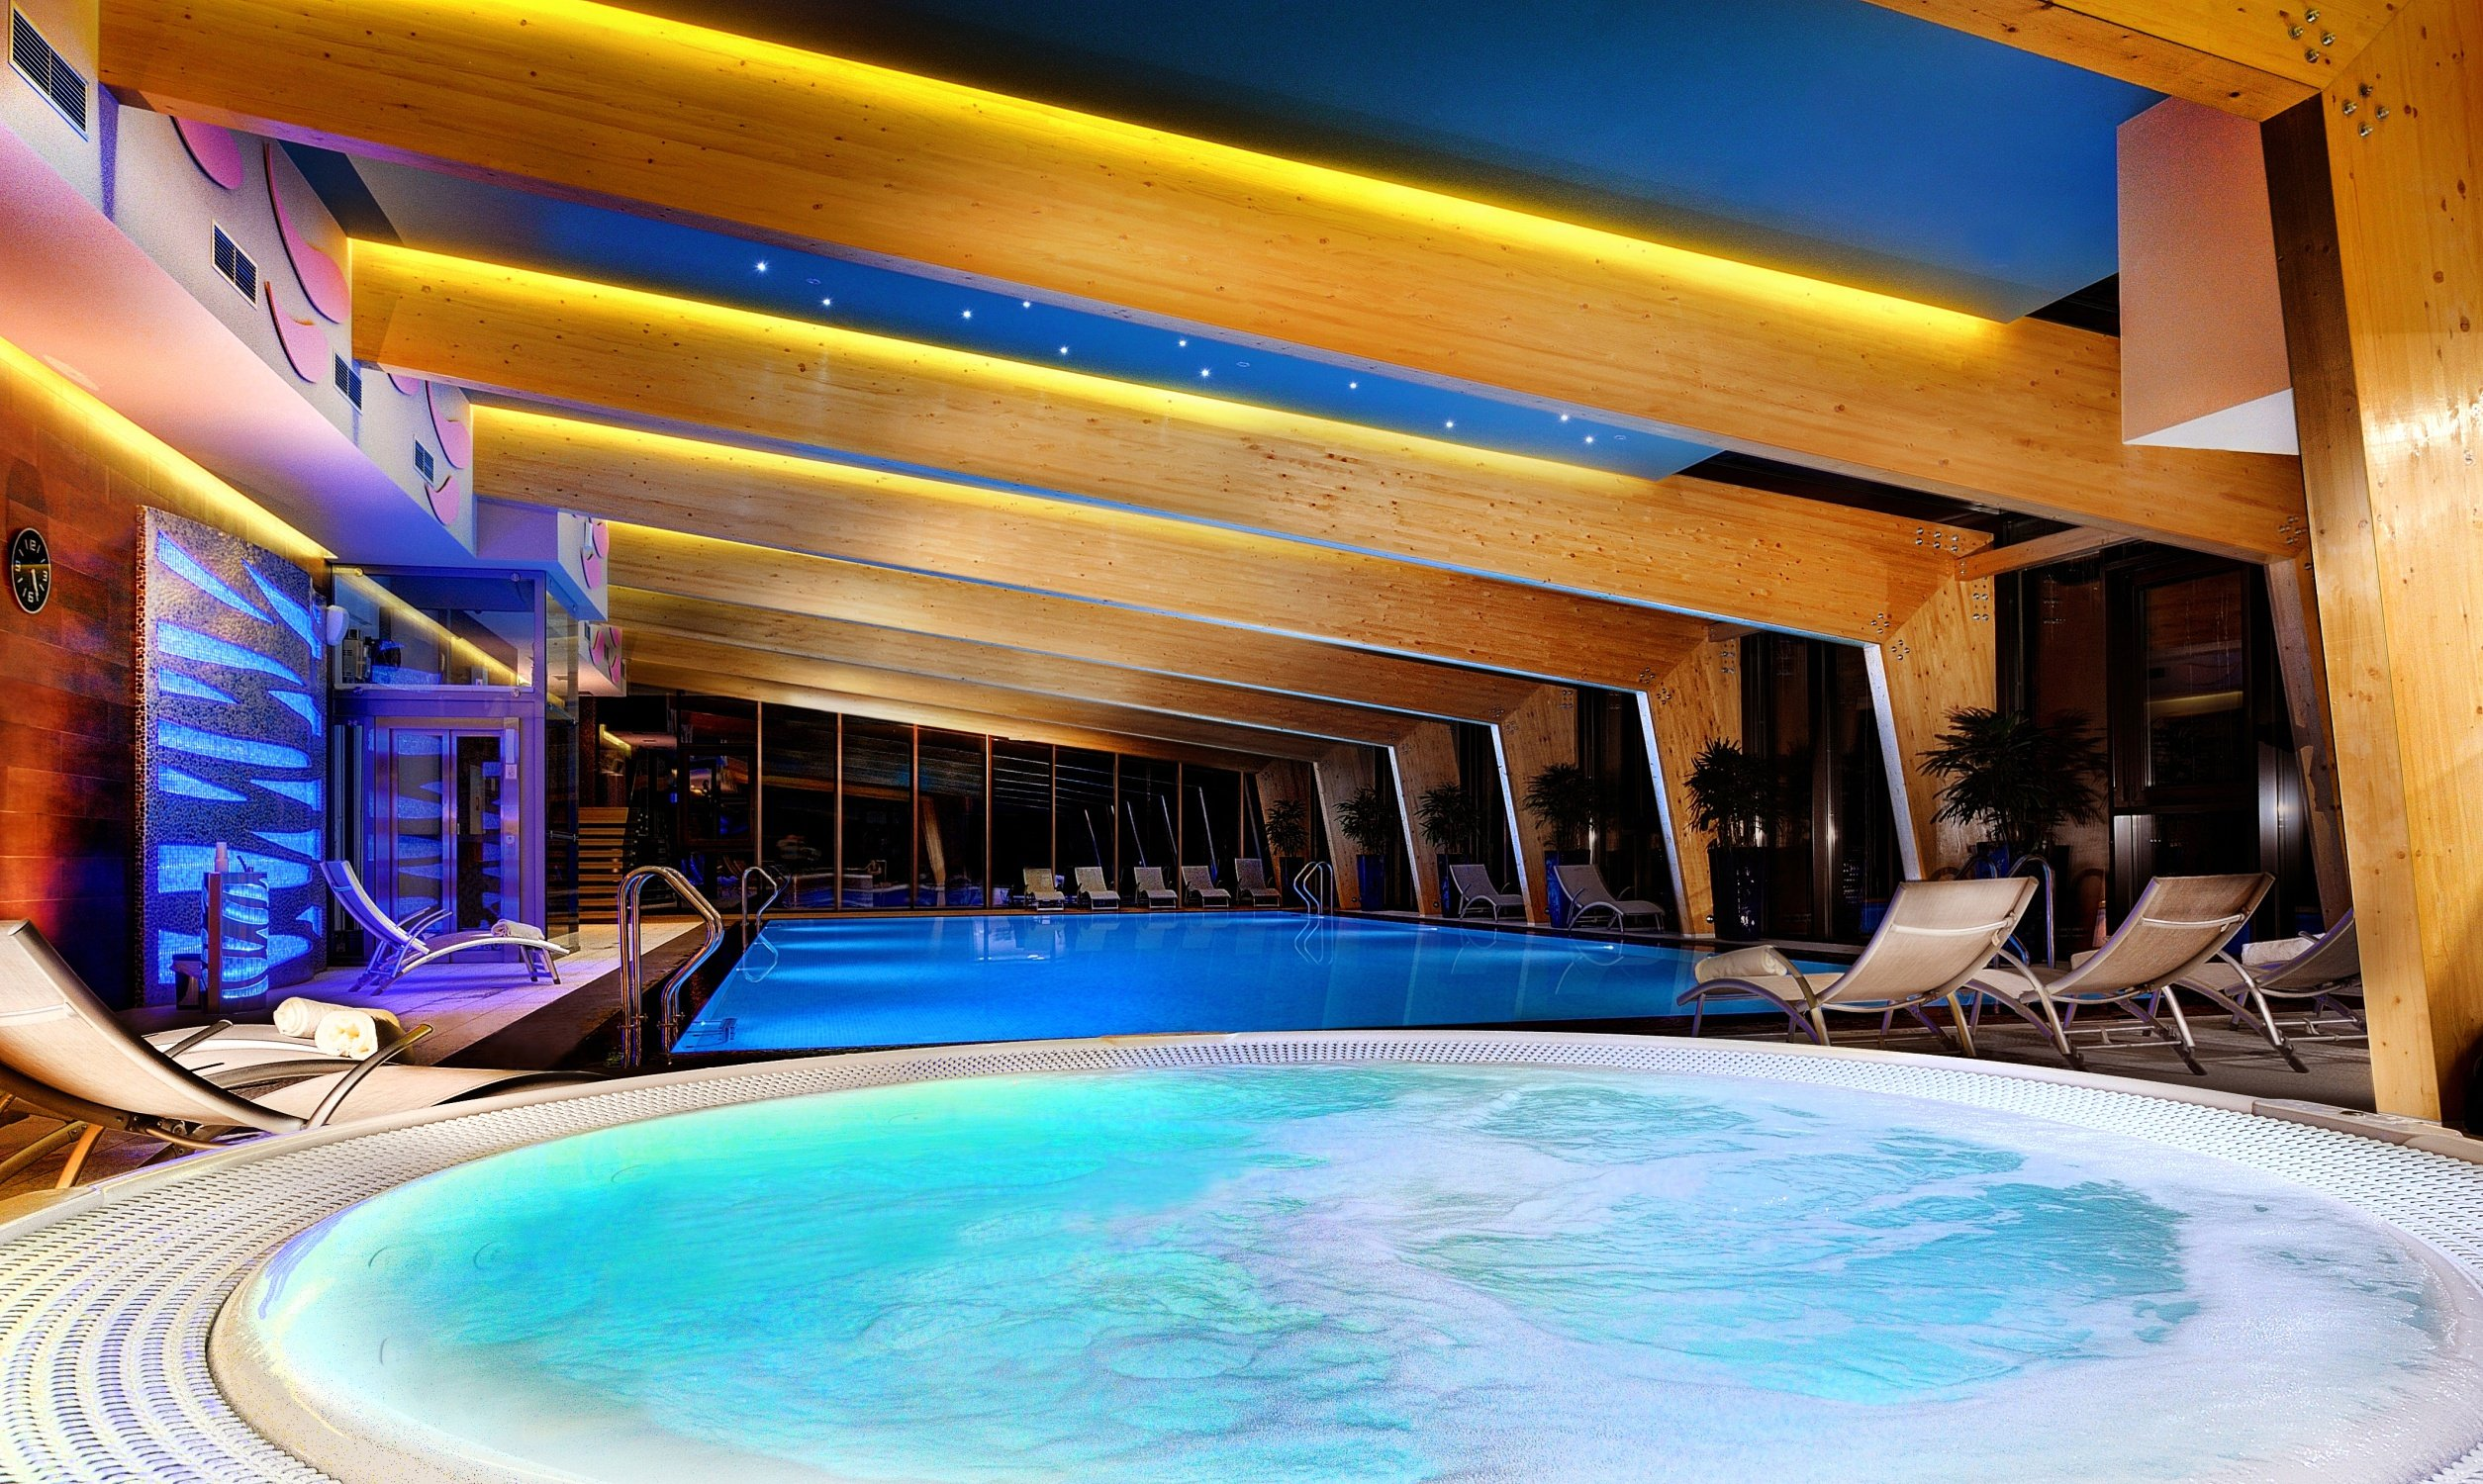 Pool and sauna world prasli ka wellness hotel chopok for Wellness hotel